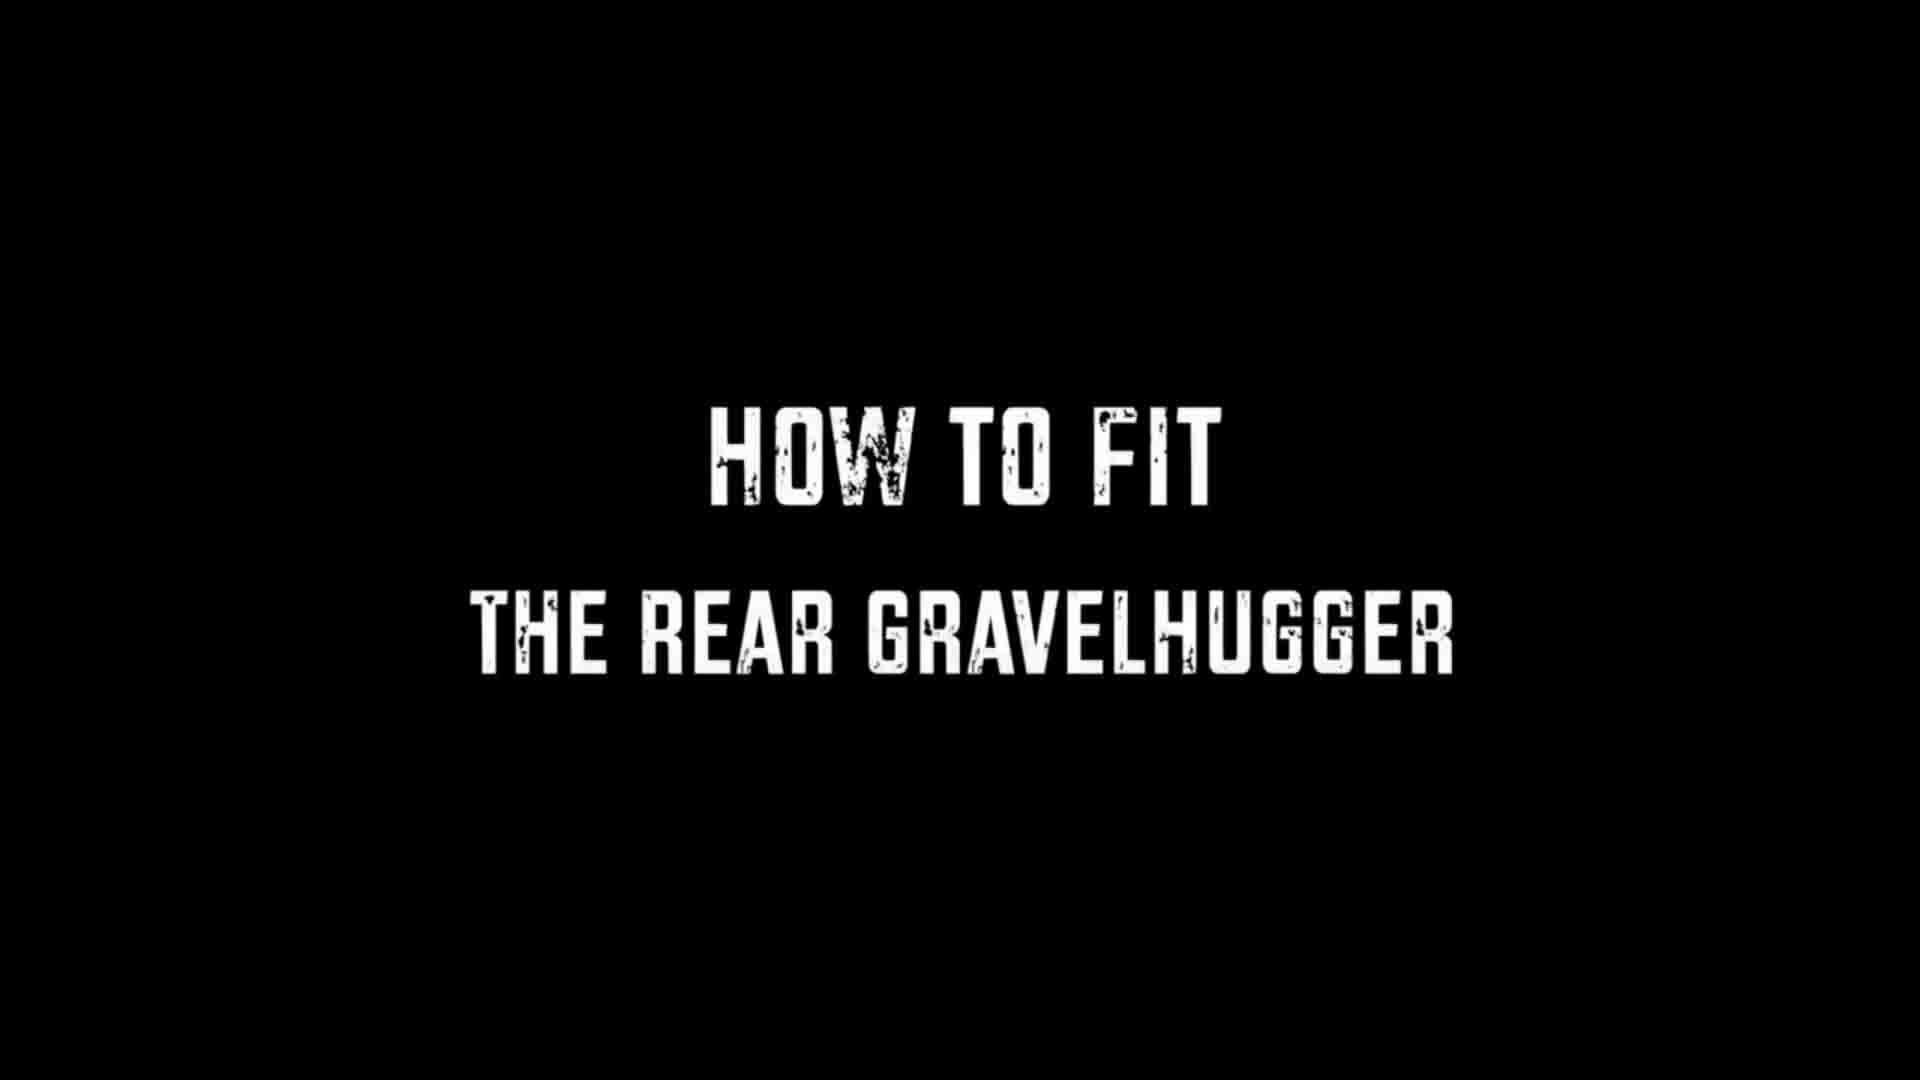 How to fit a Mudhugger Rear Gravelhugger